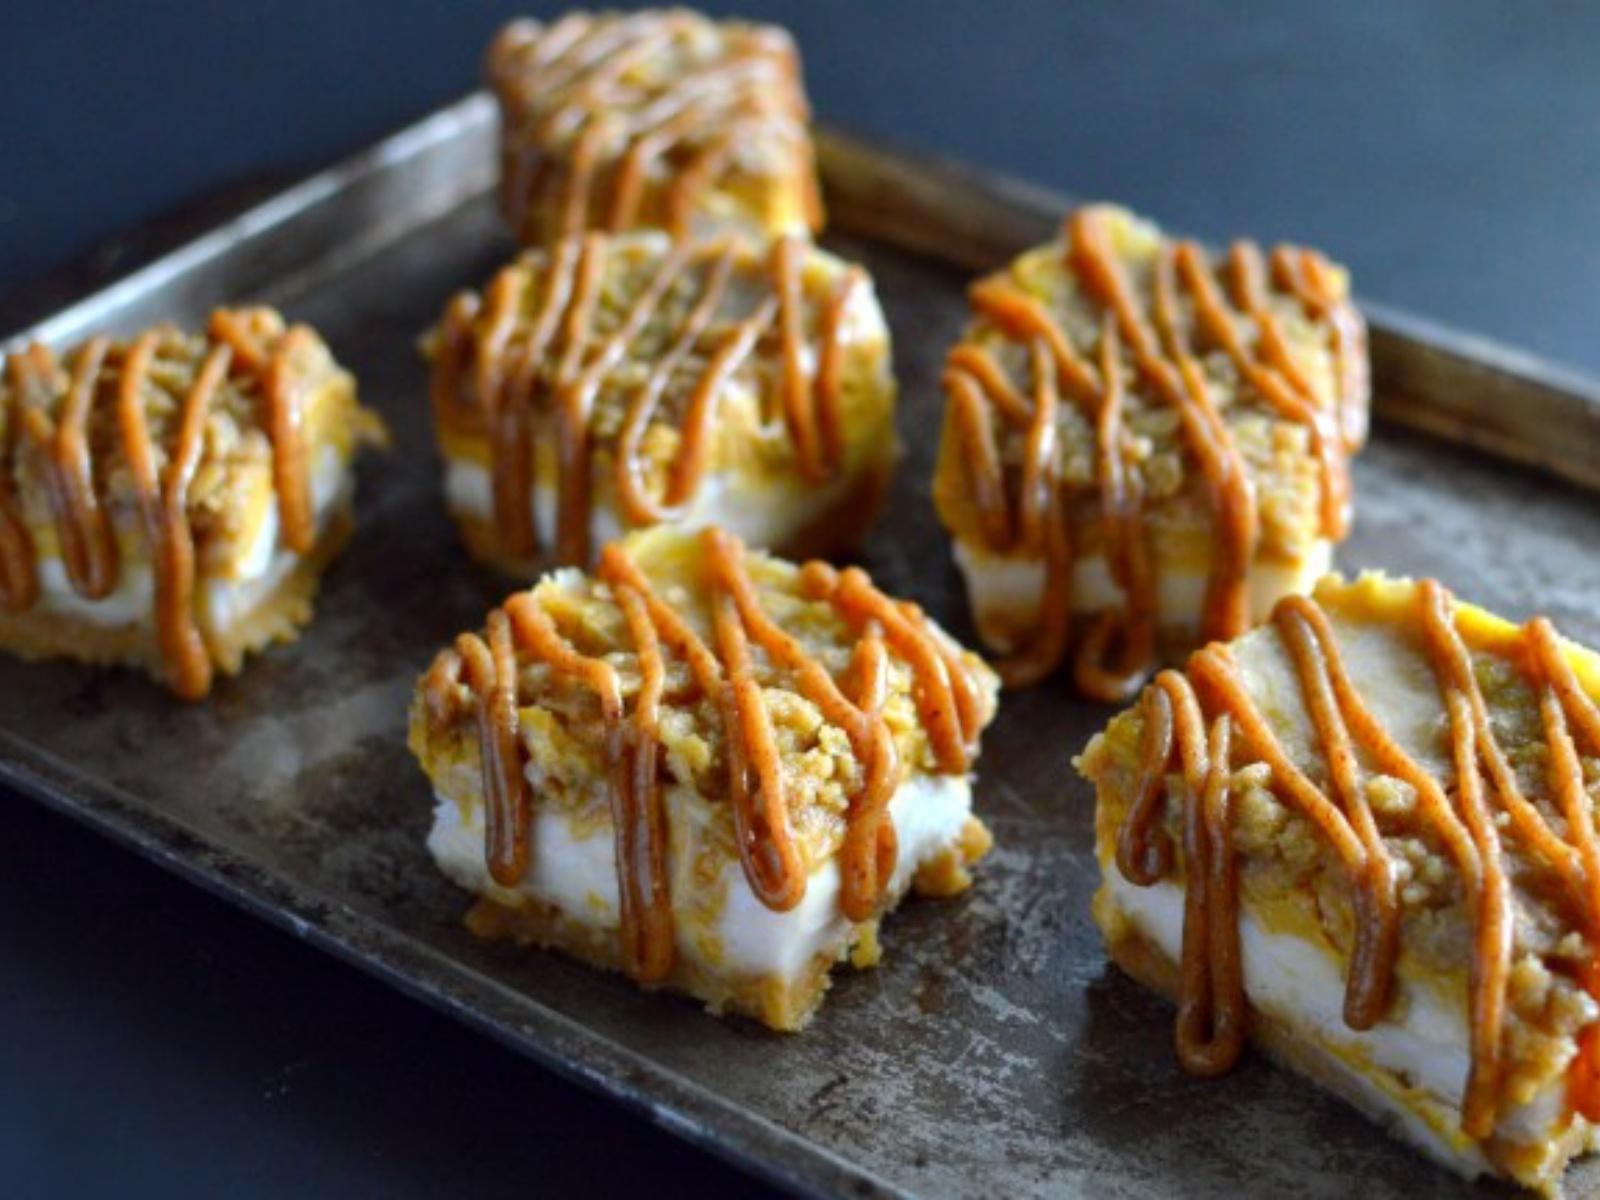 Vegan Caramel Pumpkin Pie Cheesecake with Streusel Topping